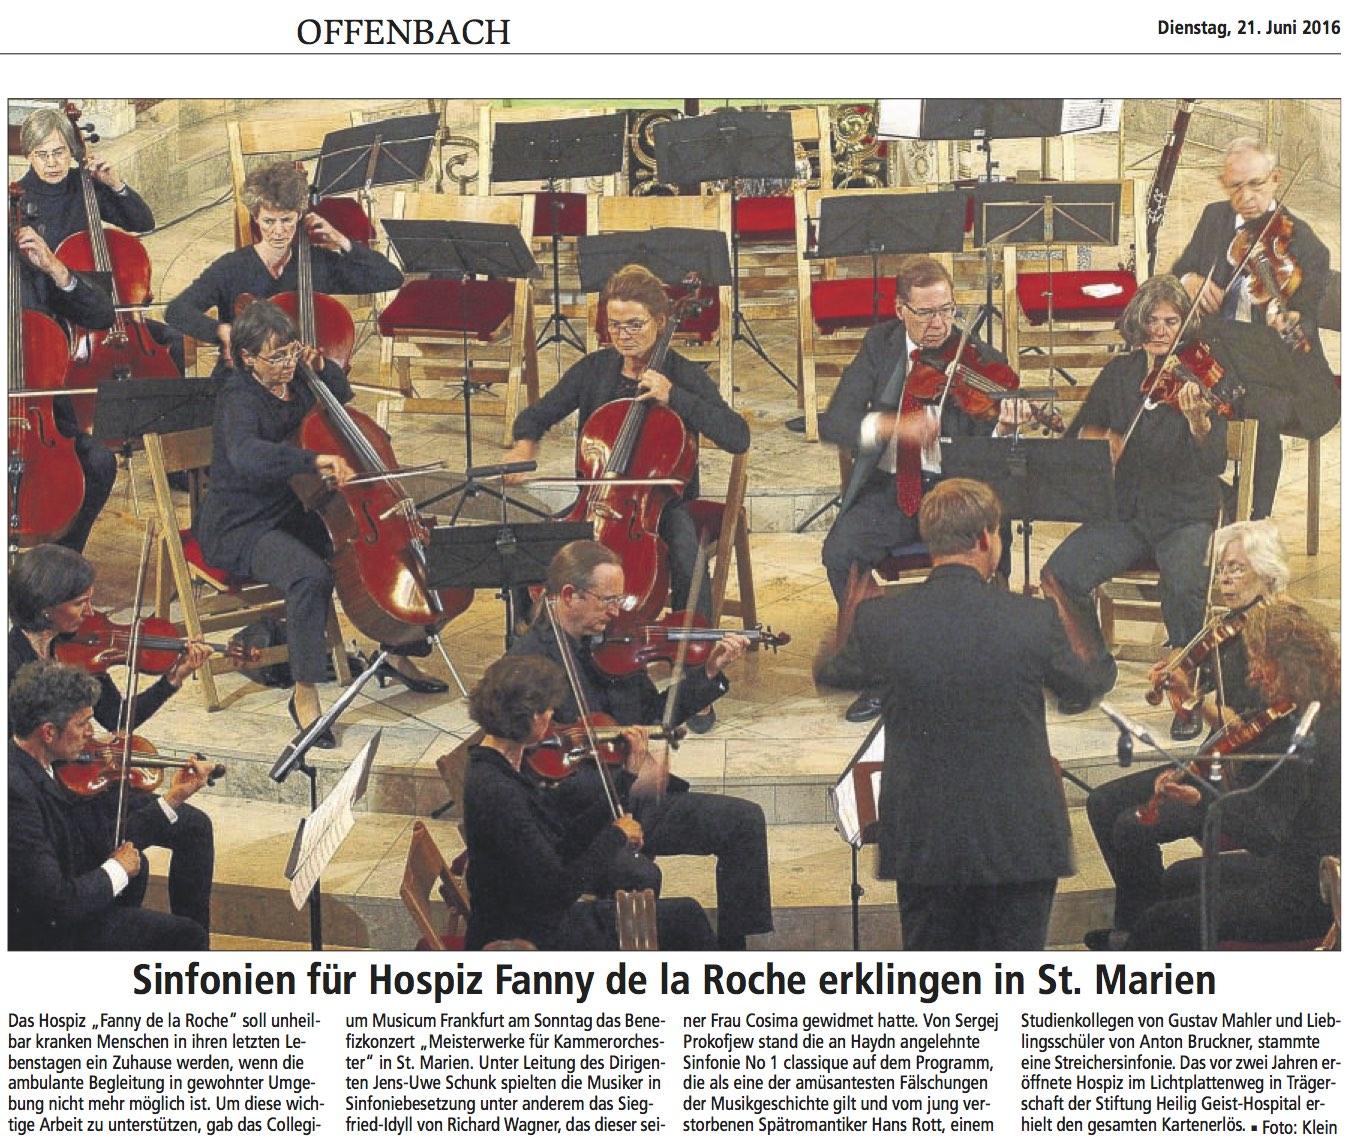 Konzertkritik Offenbach